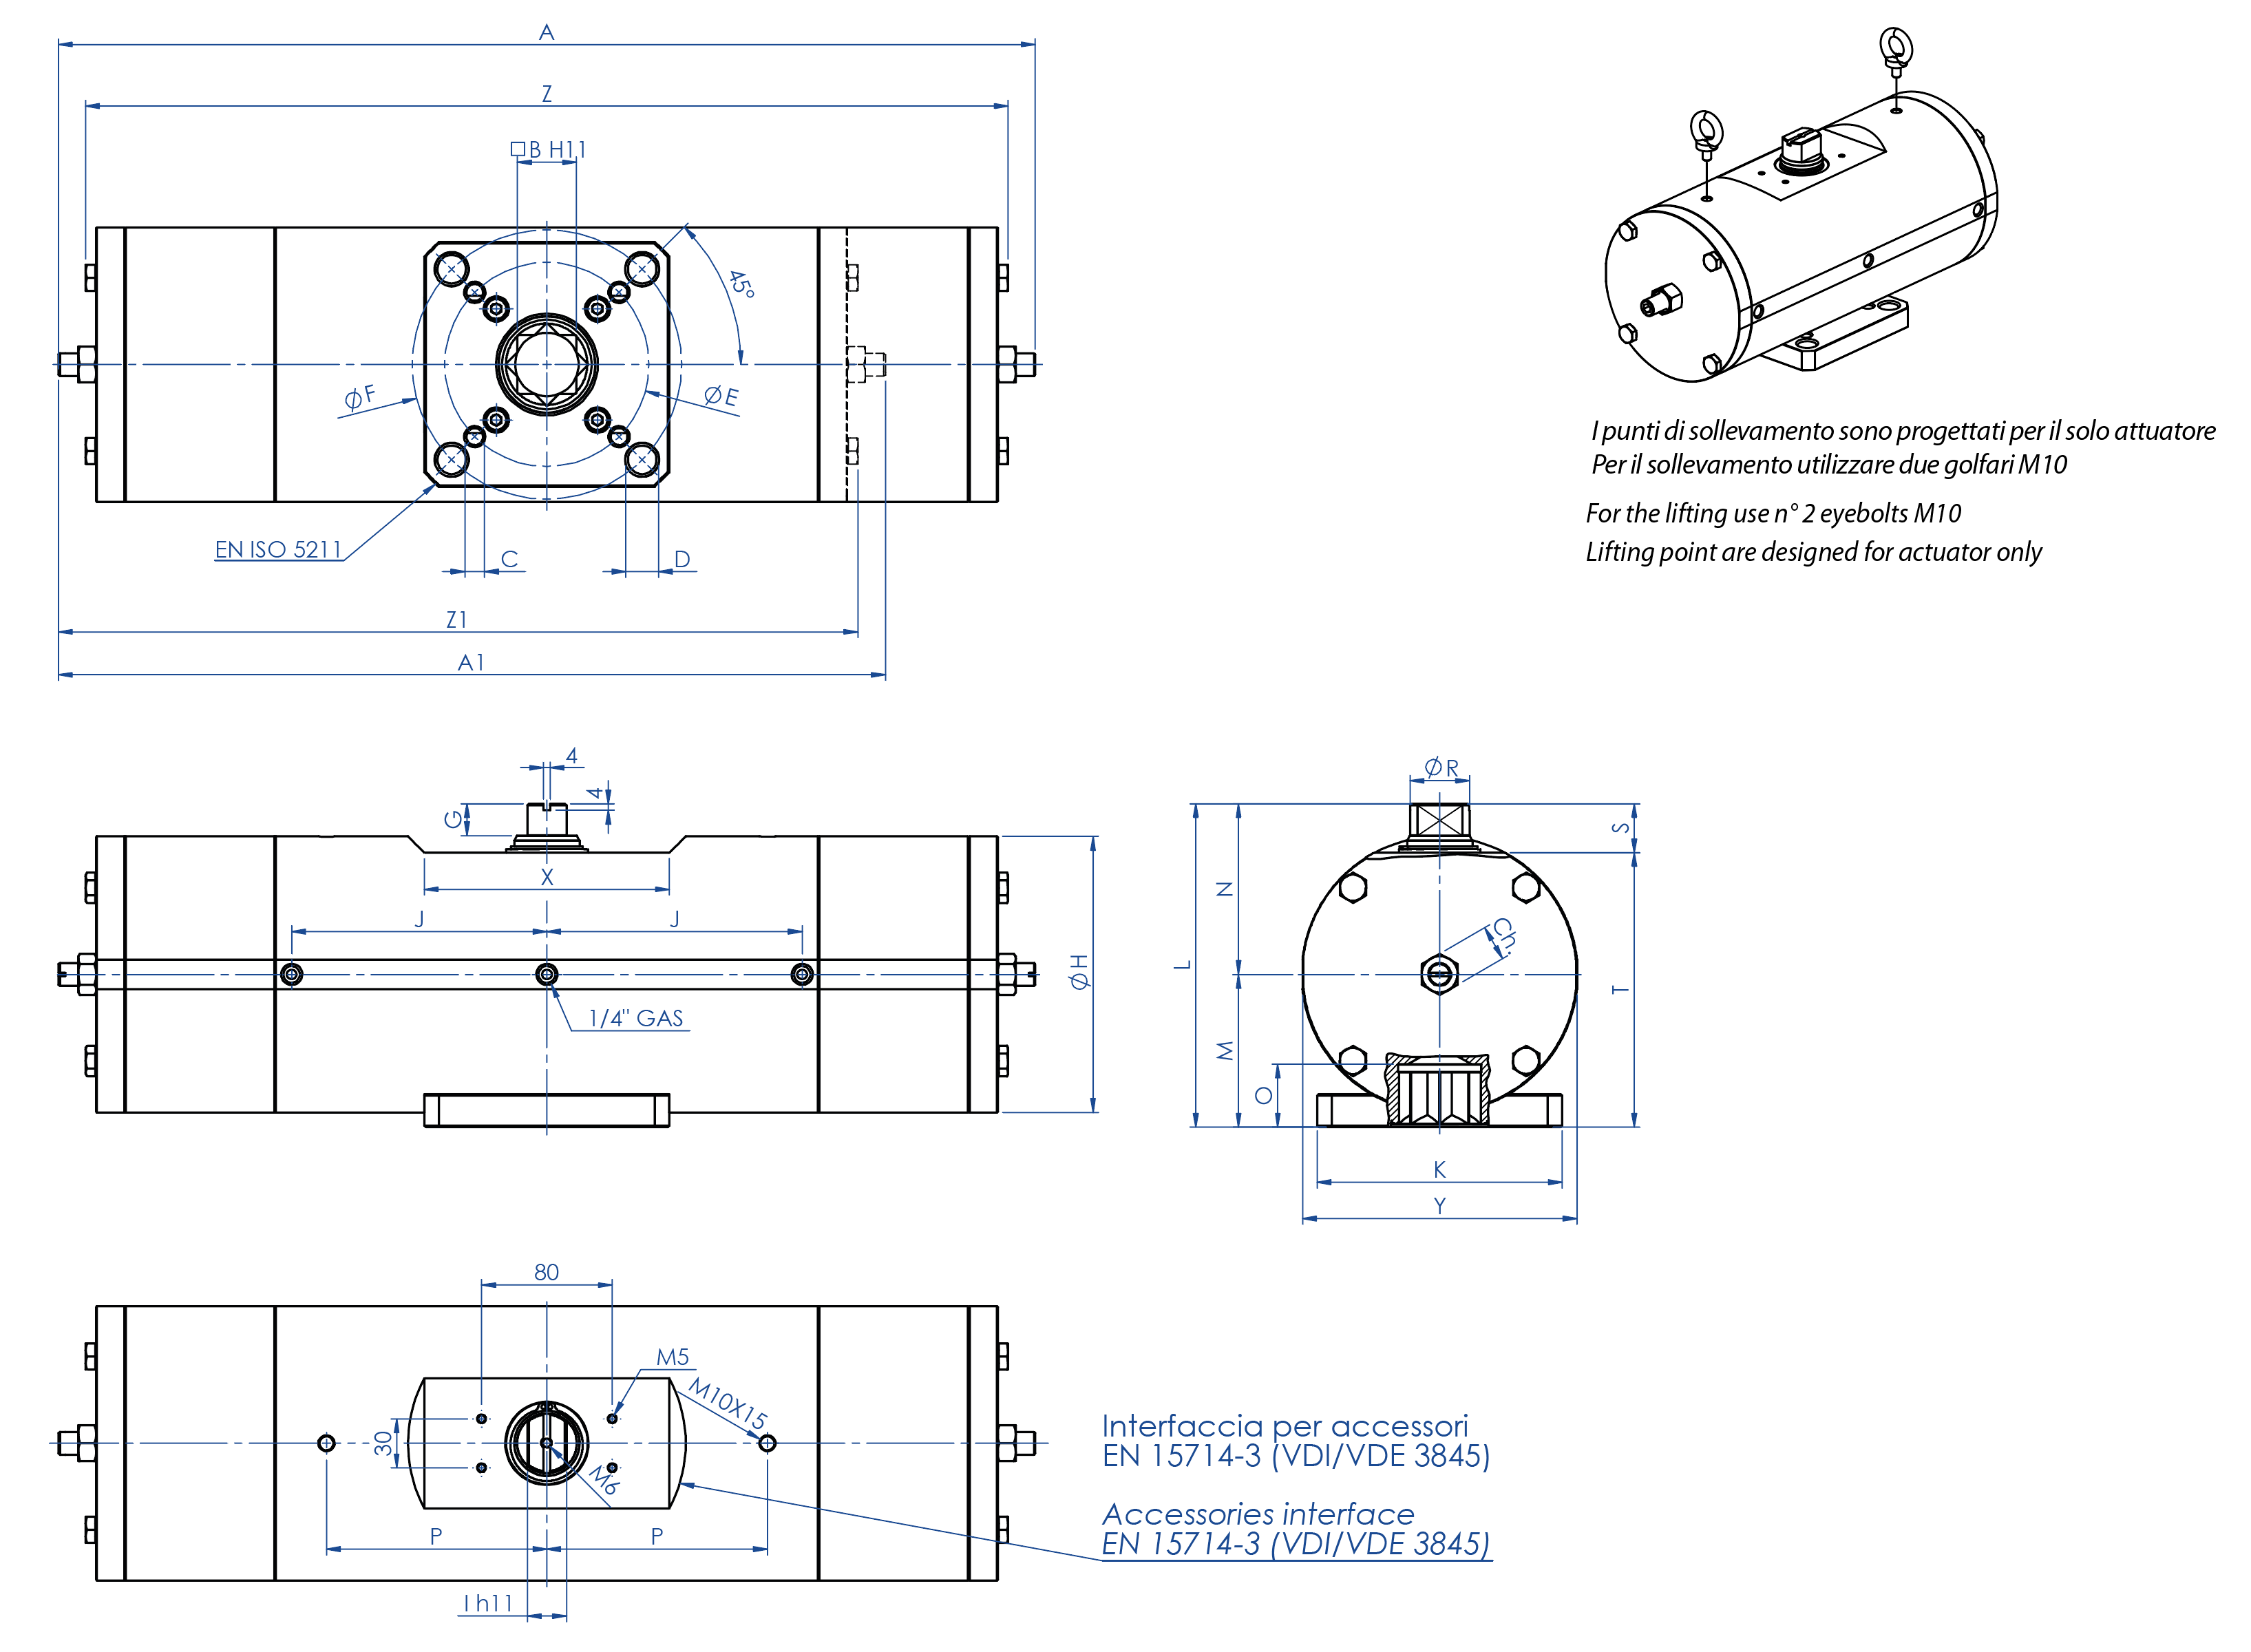 A105碳钢材质GS单效气动执行器 - 特性 -